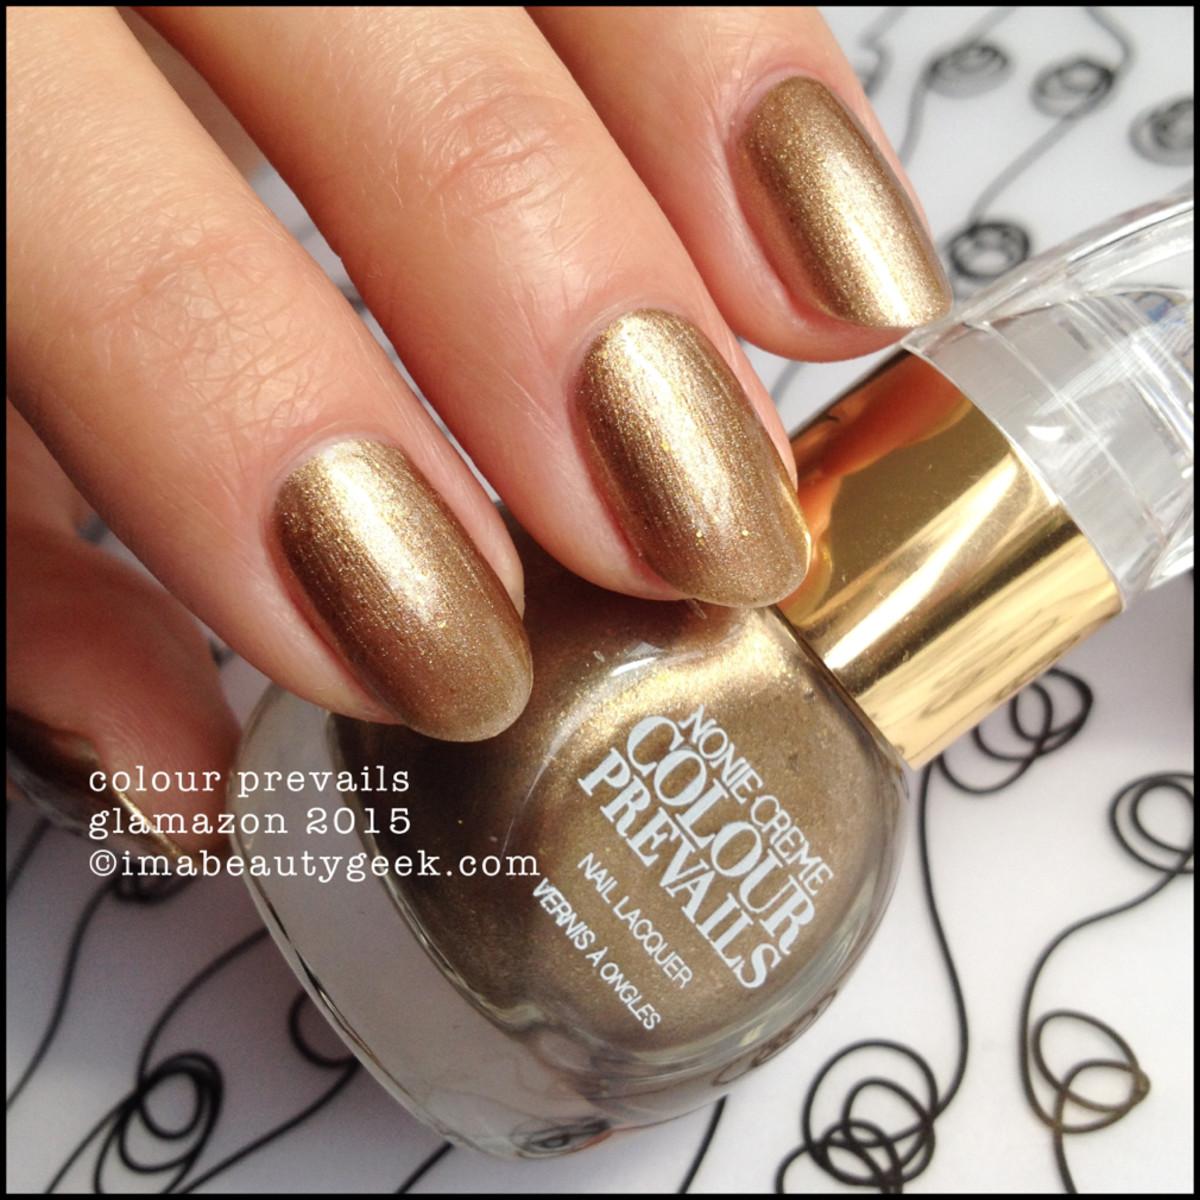 Colour Prevails Glamazon Nail Lacquer by Nonie Creme